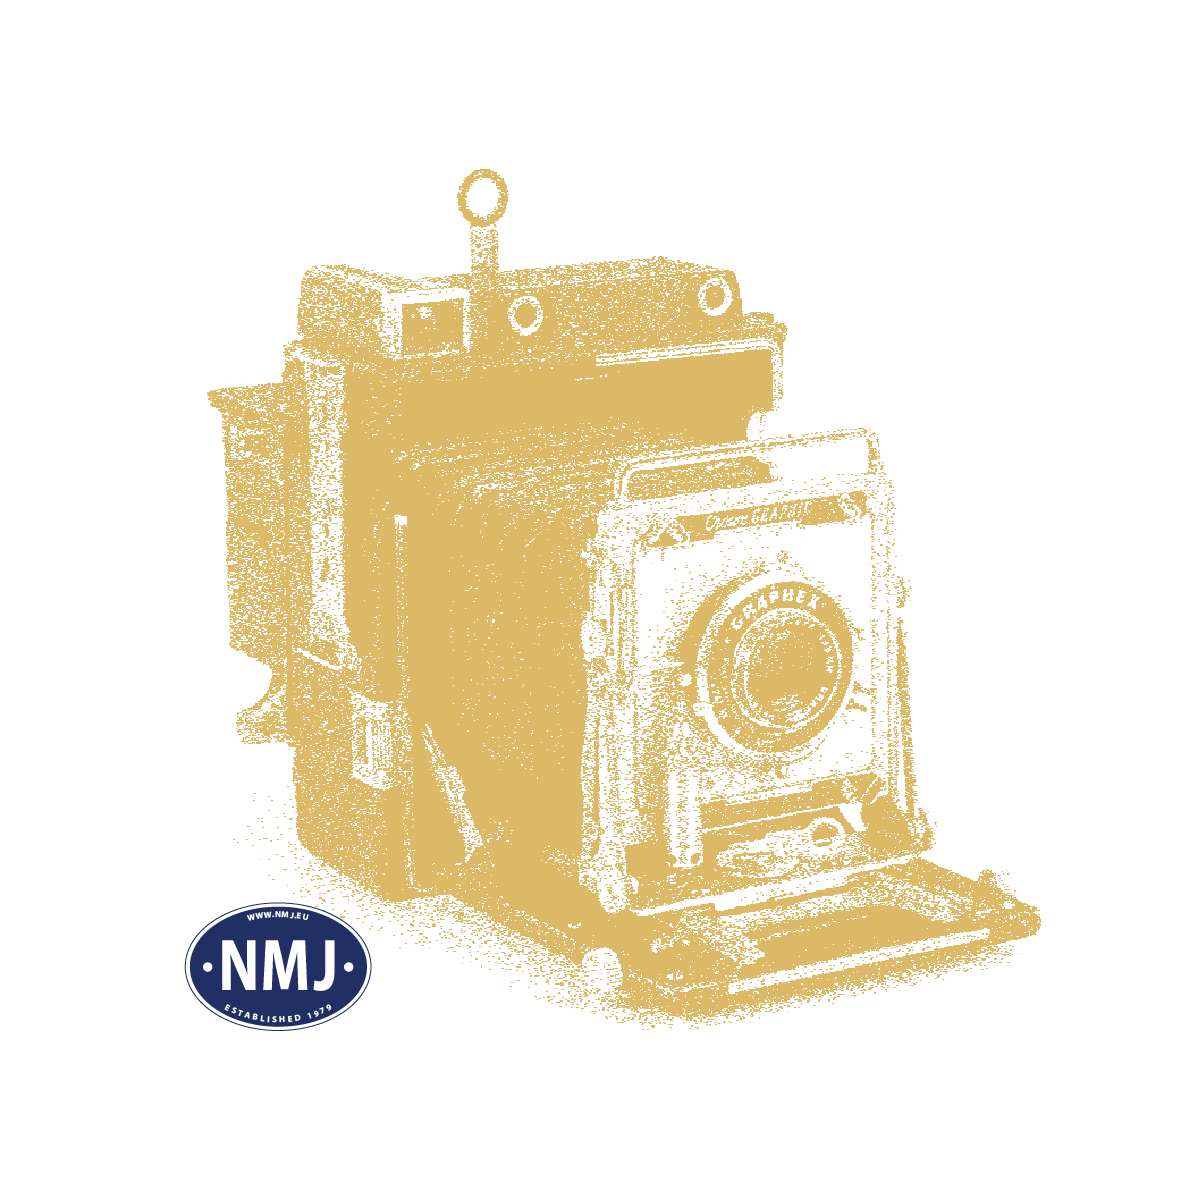 NMJT90210 - NMJ Topline MAV M61.013, DCC m/ Sound